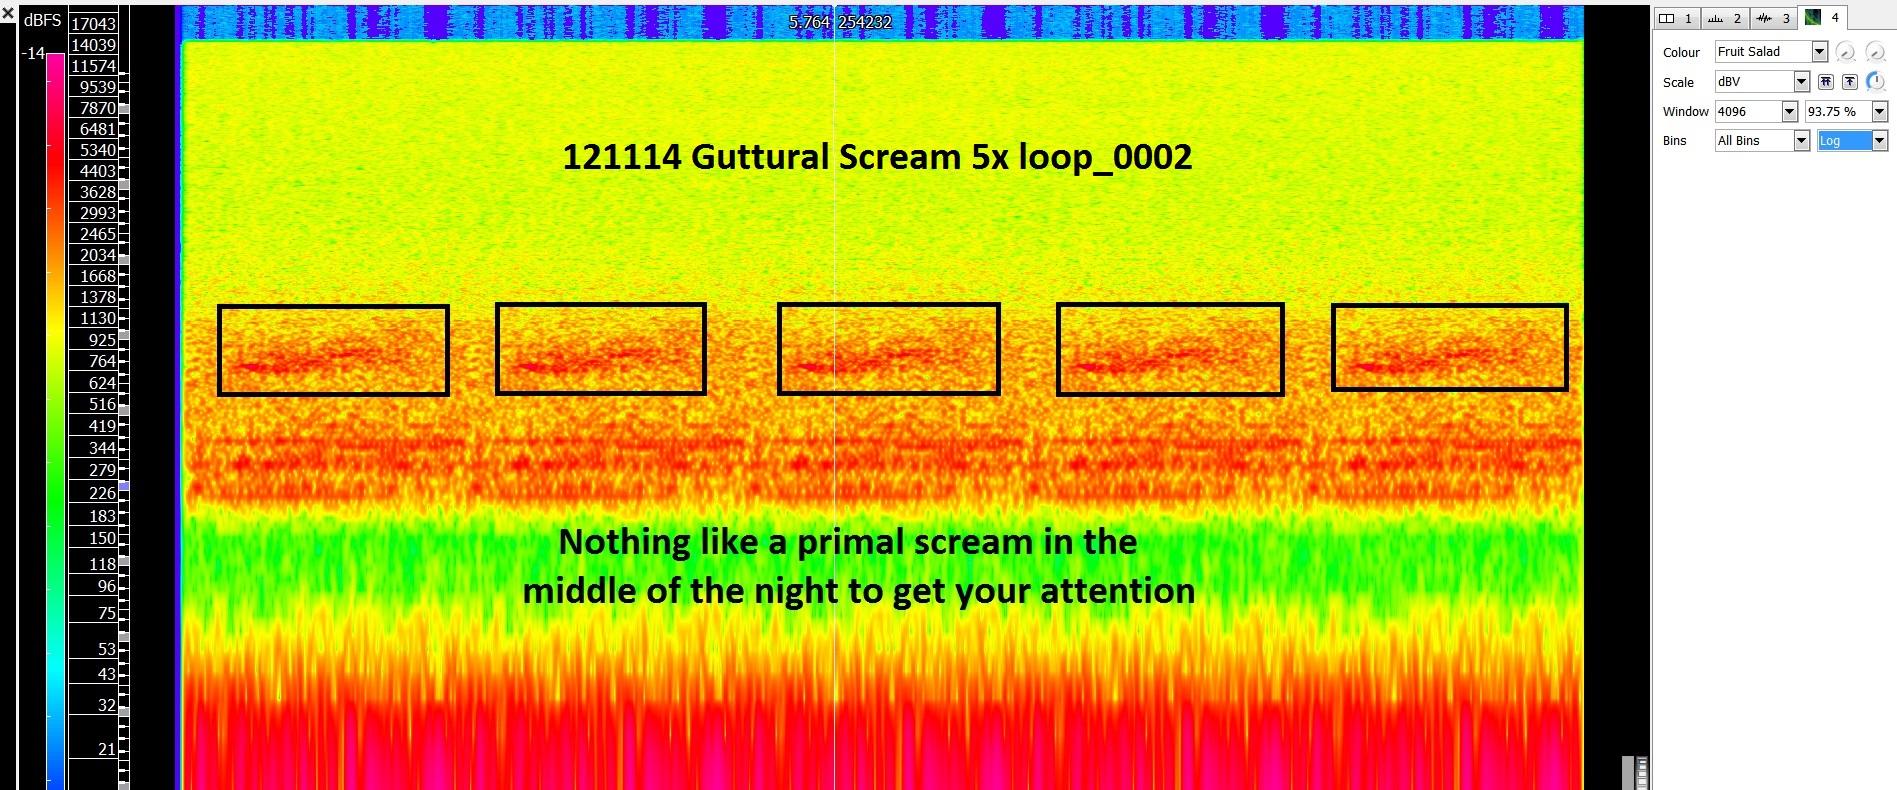 Guttural Scream